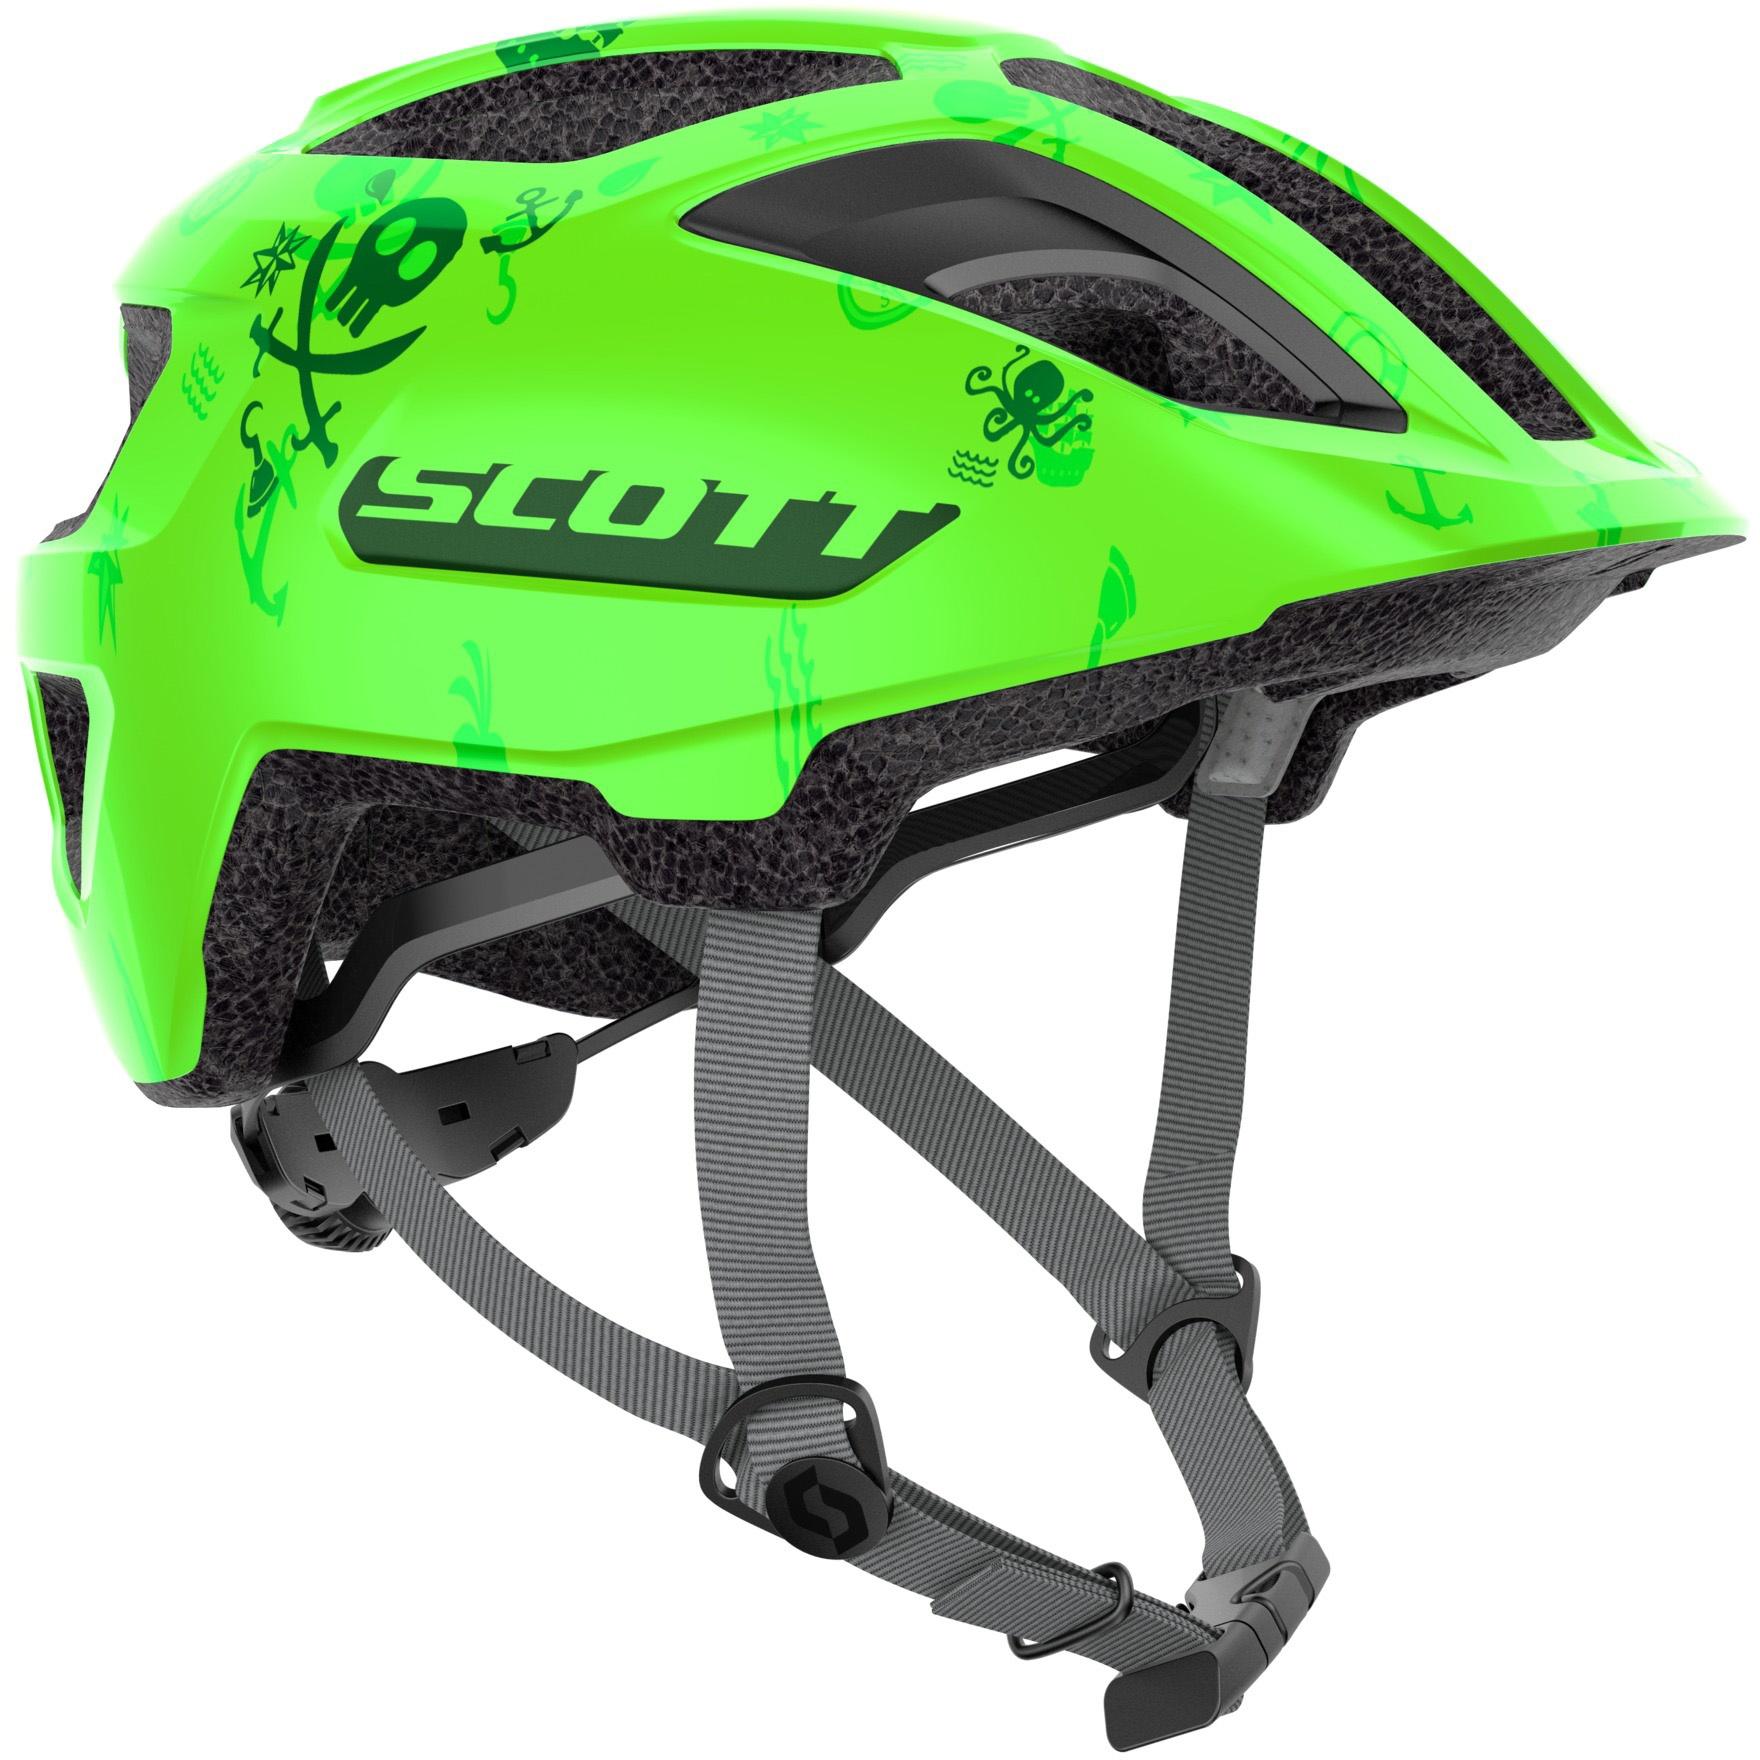 Køb Scott Spunto Junior m. LED lys Hjelm – Grøn